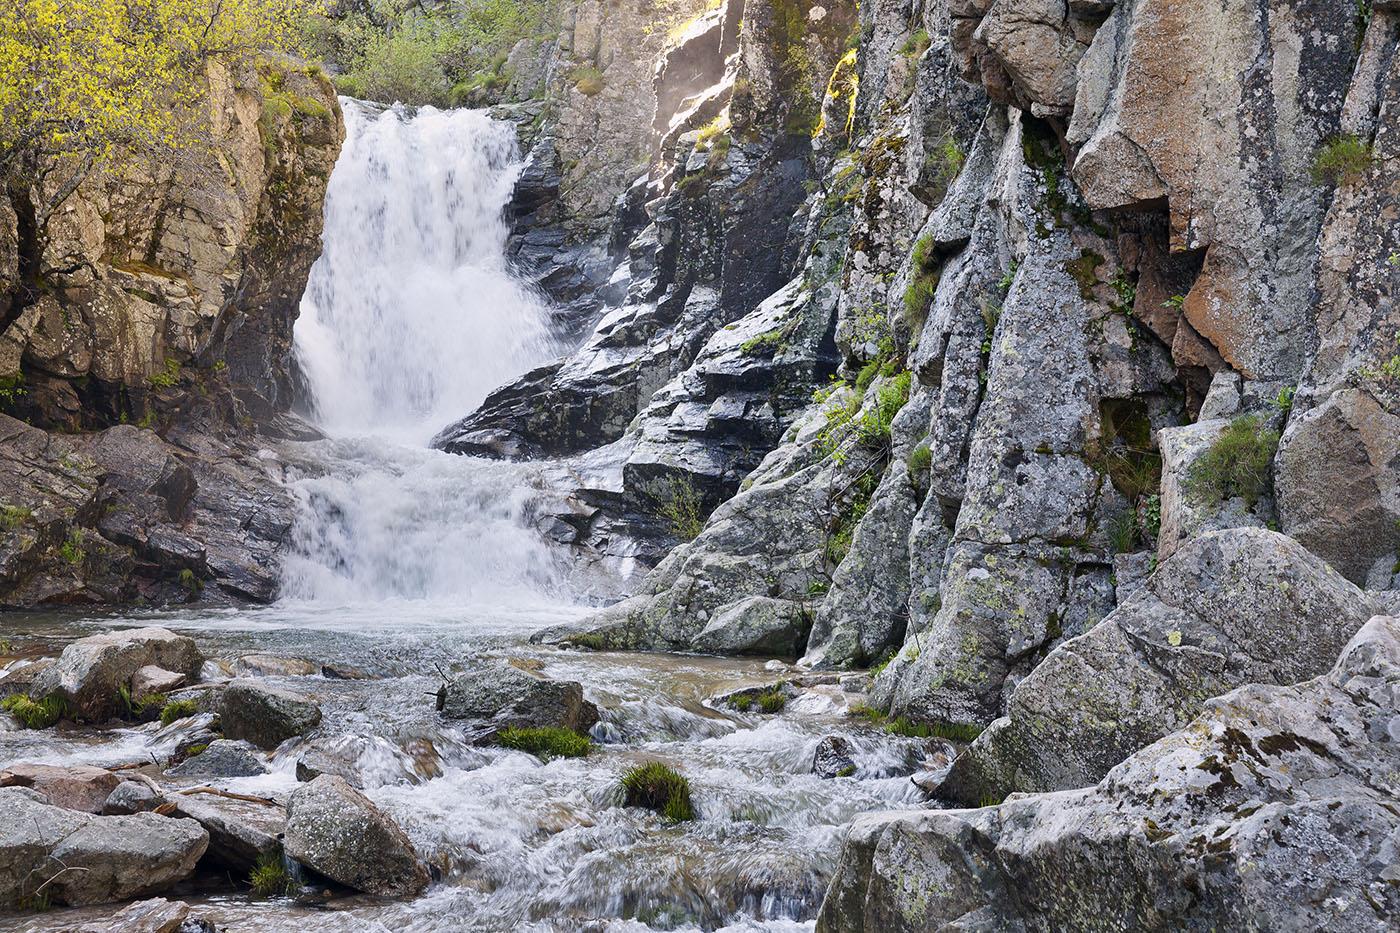 Cascadas de Sierra de Guadarrama: del Purgatorio